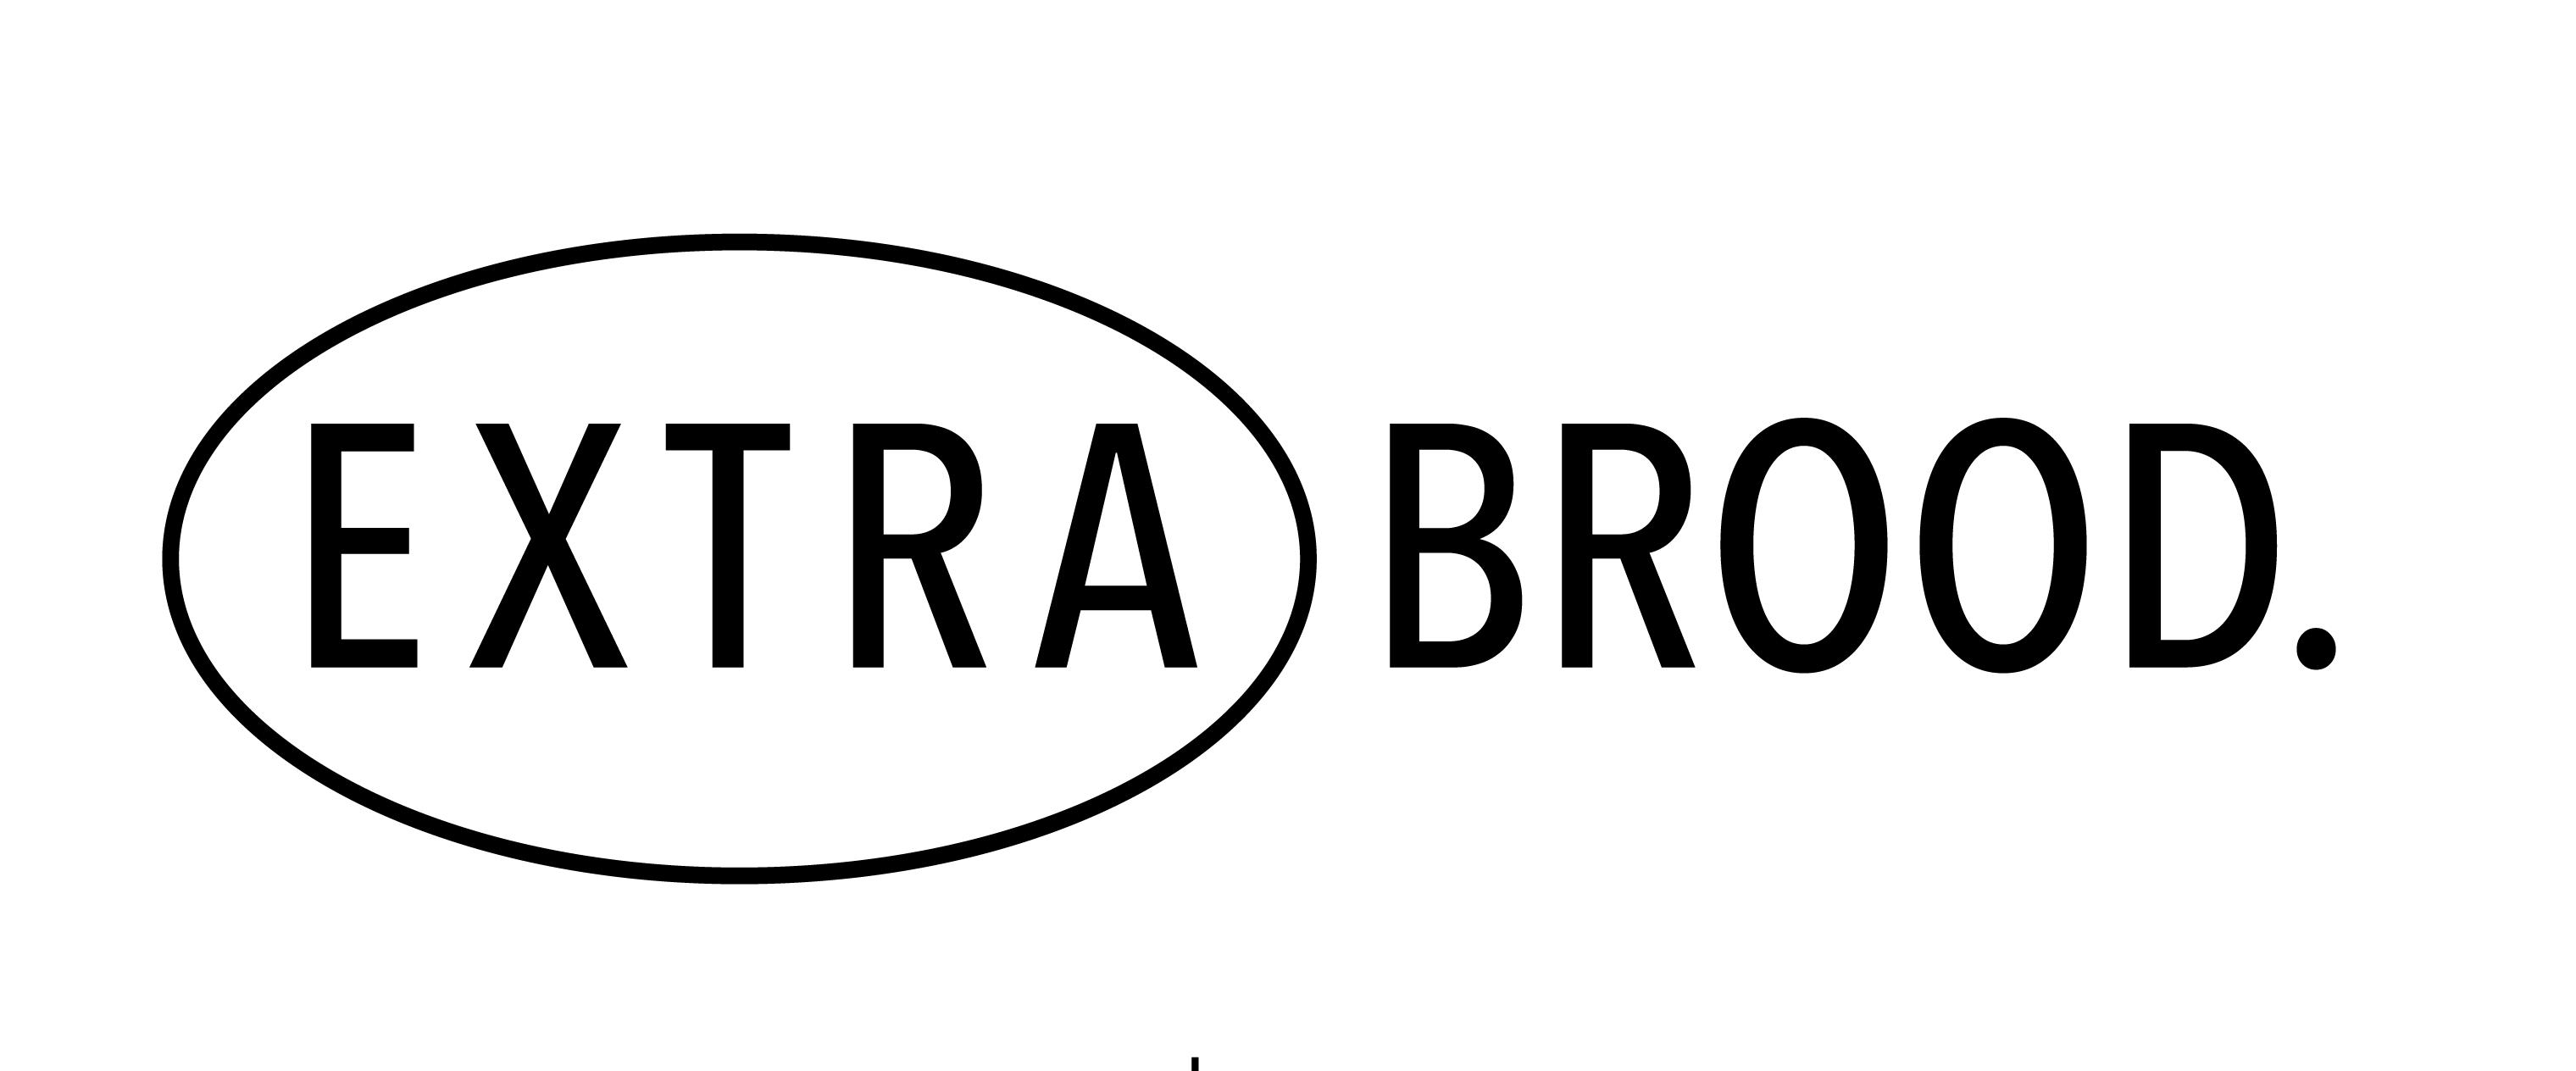 Extra brood.